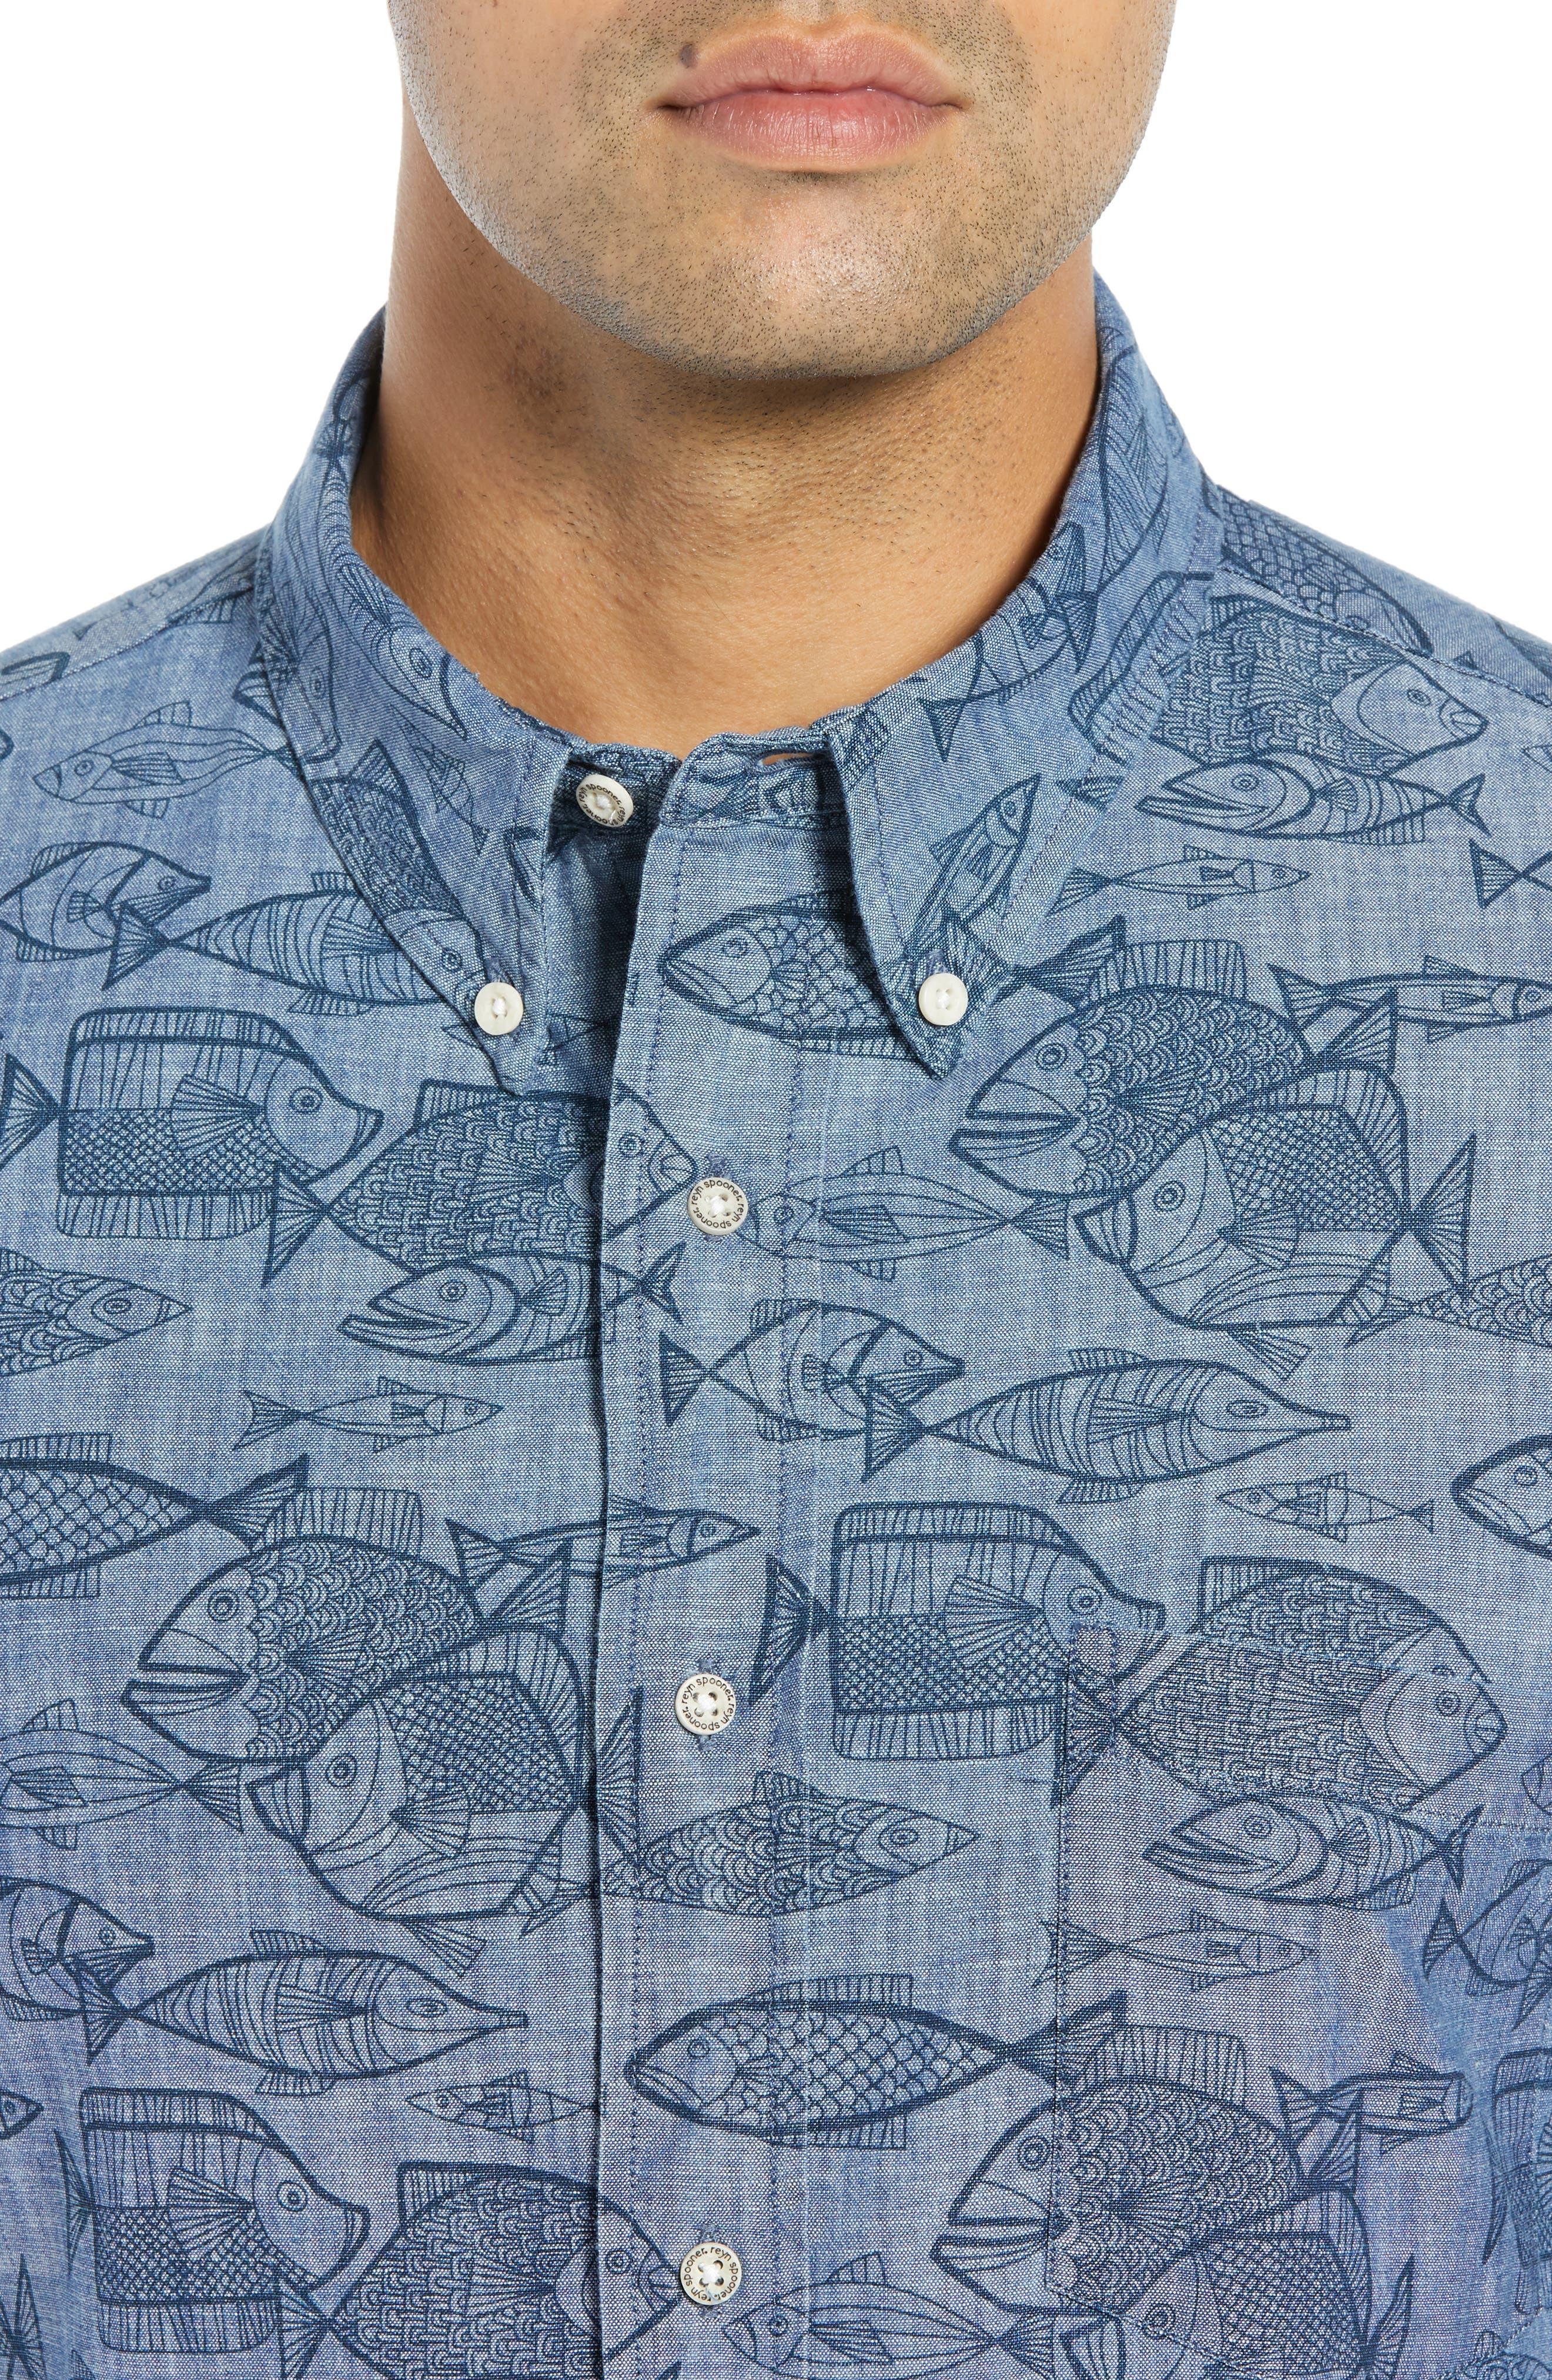 REYN SPOONER, Kauhulu Tailored Fit Sport Shirt, Alternate thumbnail 2, color, CHAMBRAY BLUE